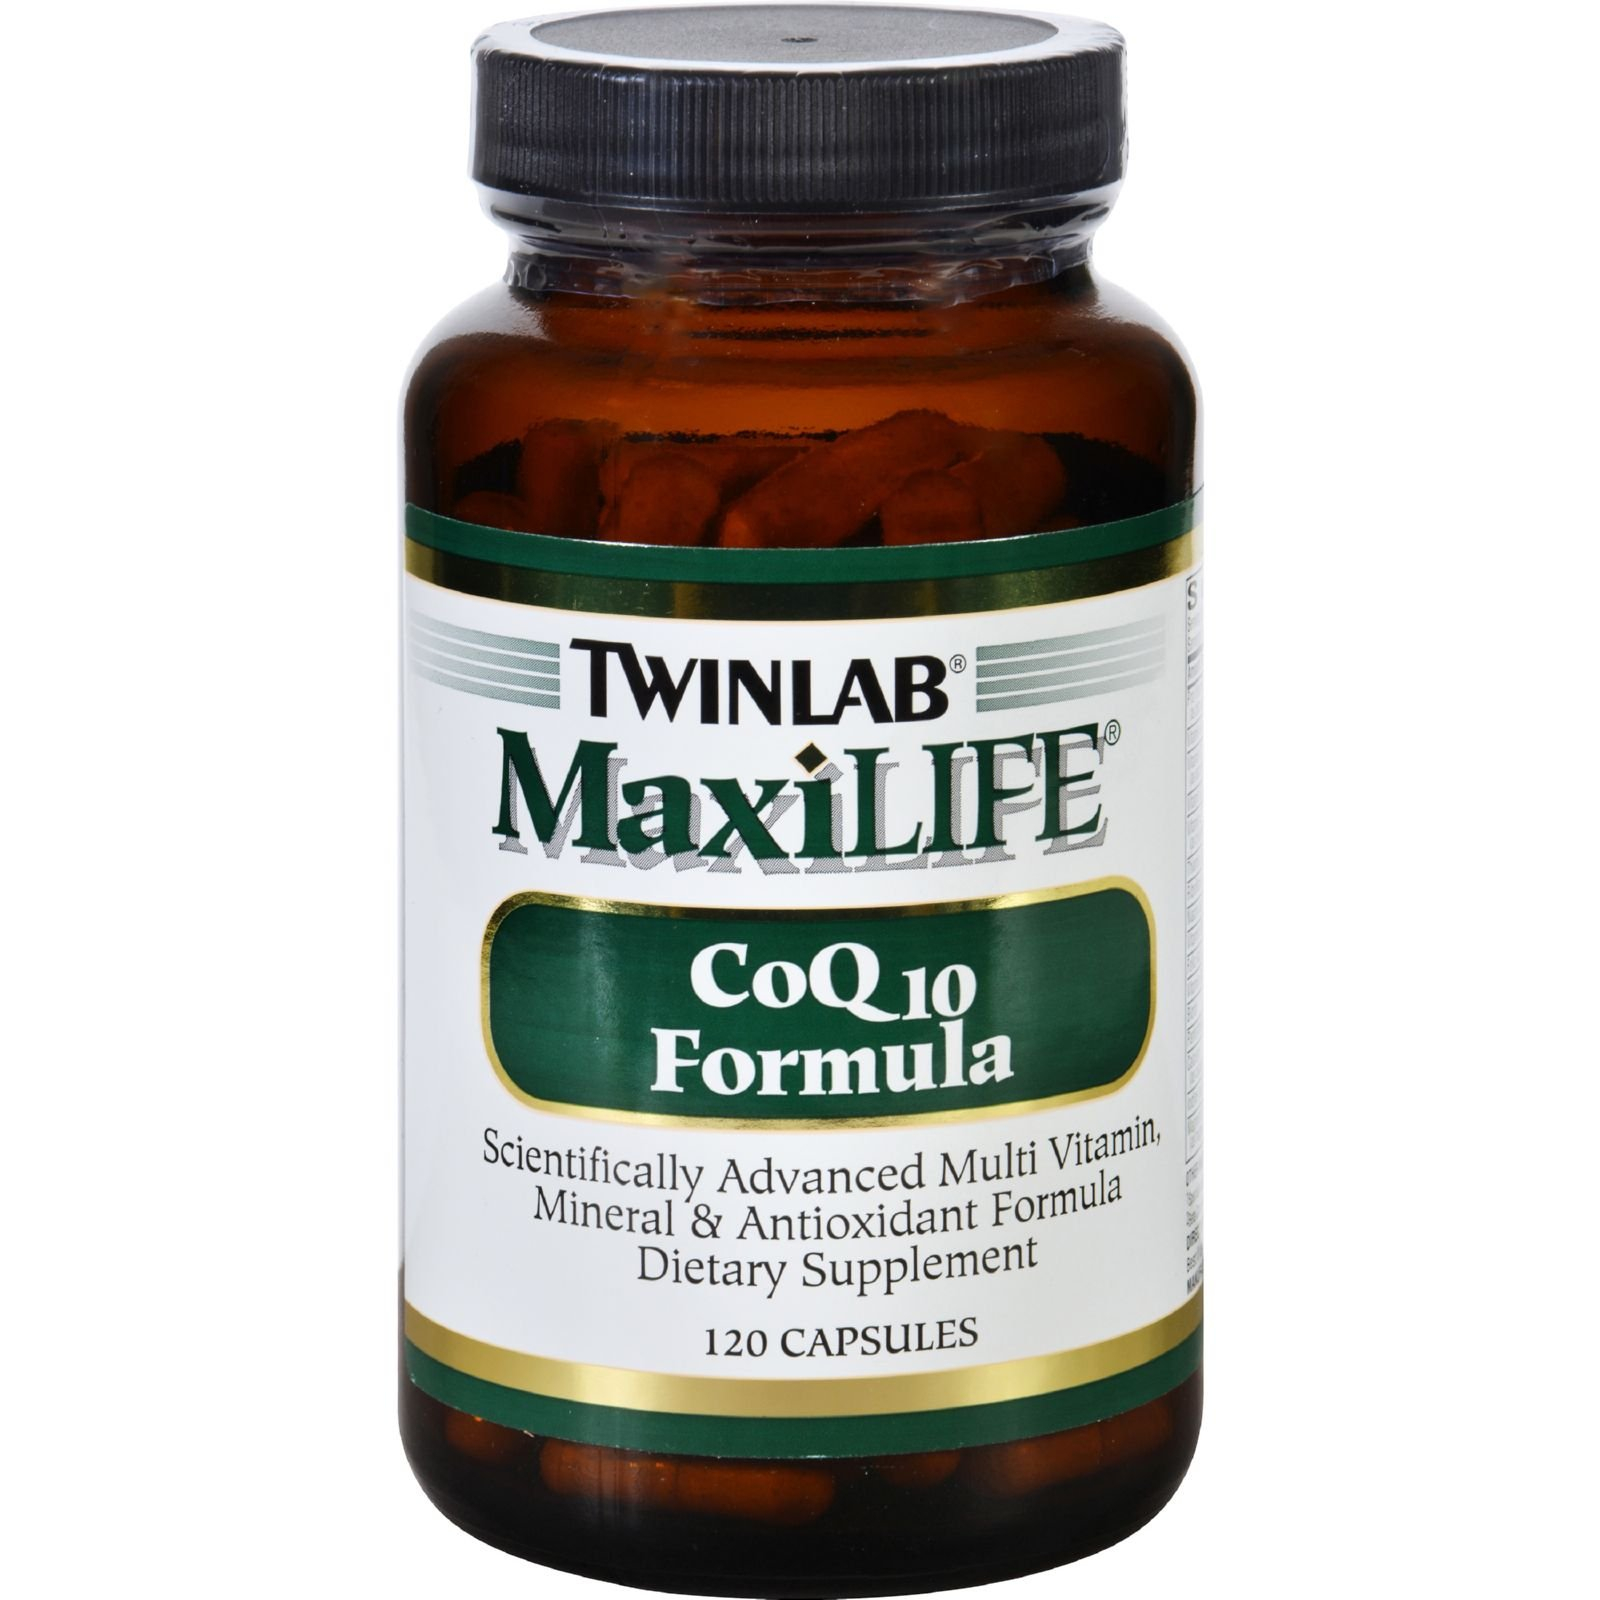 Twinlab MaxiLIFE CoQ10 Formula - Multi Vitamin, Mineral and Antioxidant Formula - 120 Capsules (Pack of 3)